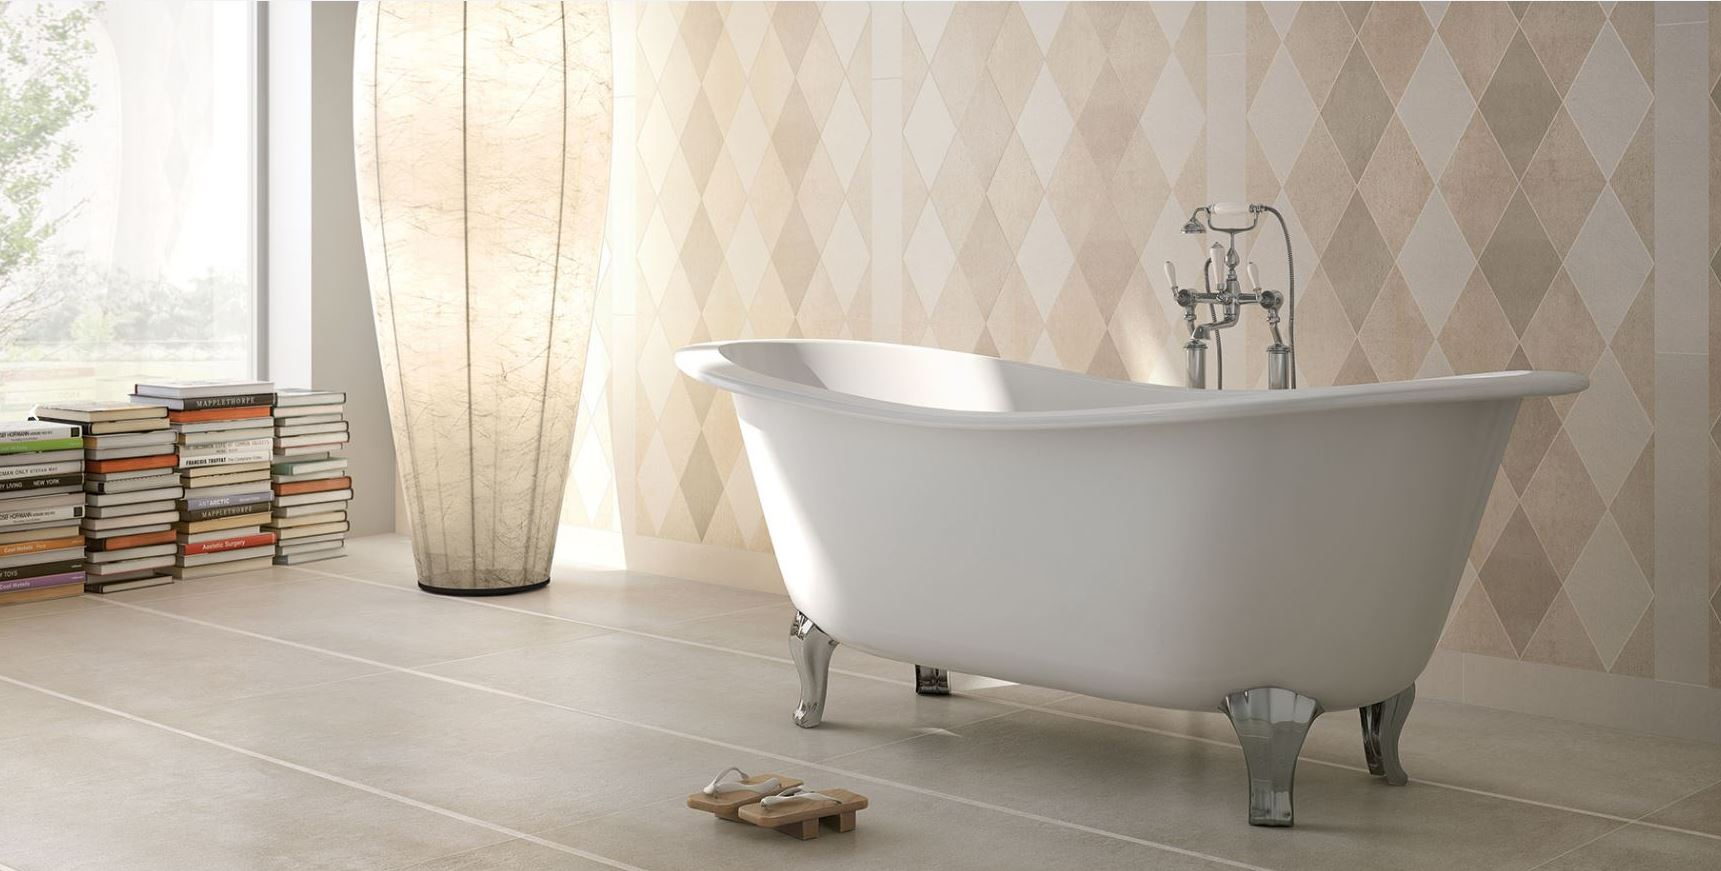 Bathroom tiles marlin ceramic tiles slide title marlin tiles dailygadgetfo Images